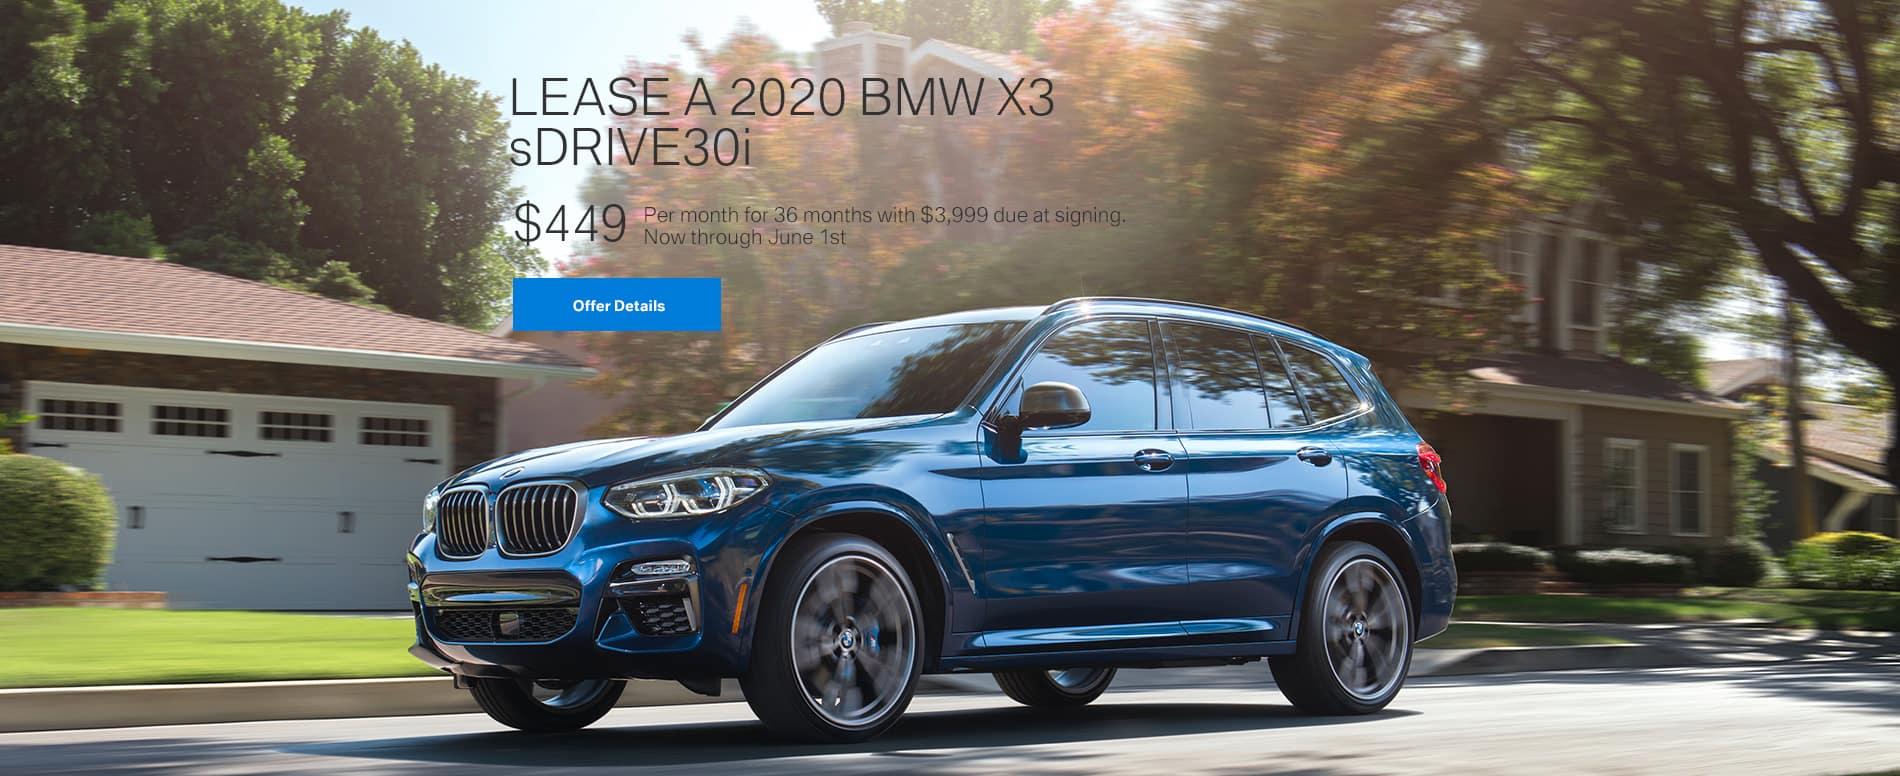 Lease a 2020 BMW X3 sDrive30i $449/mo.